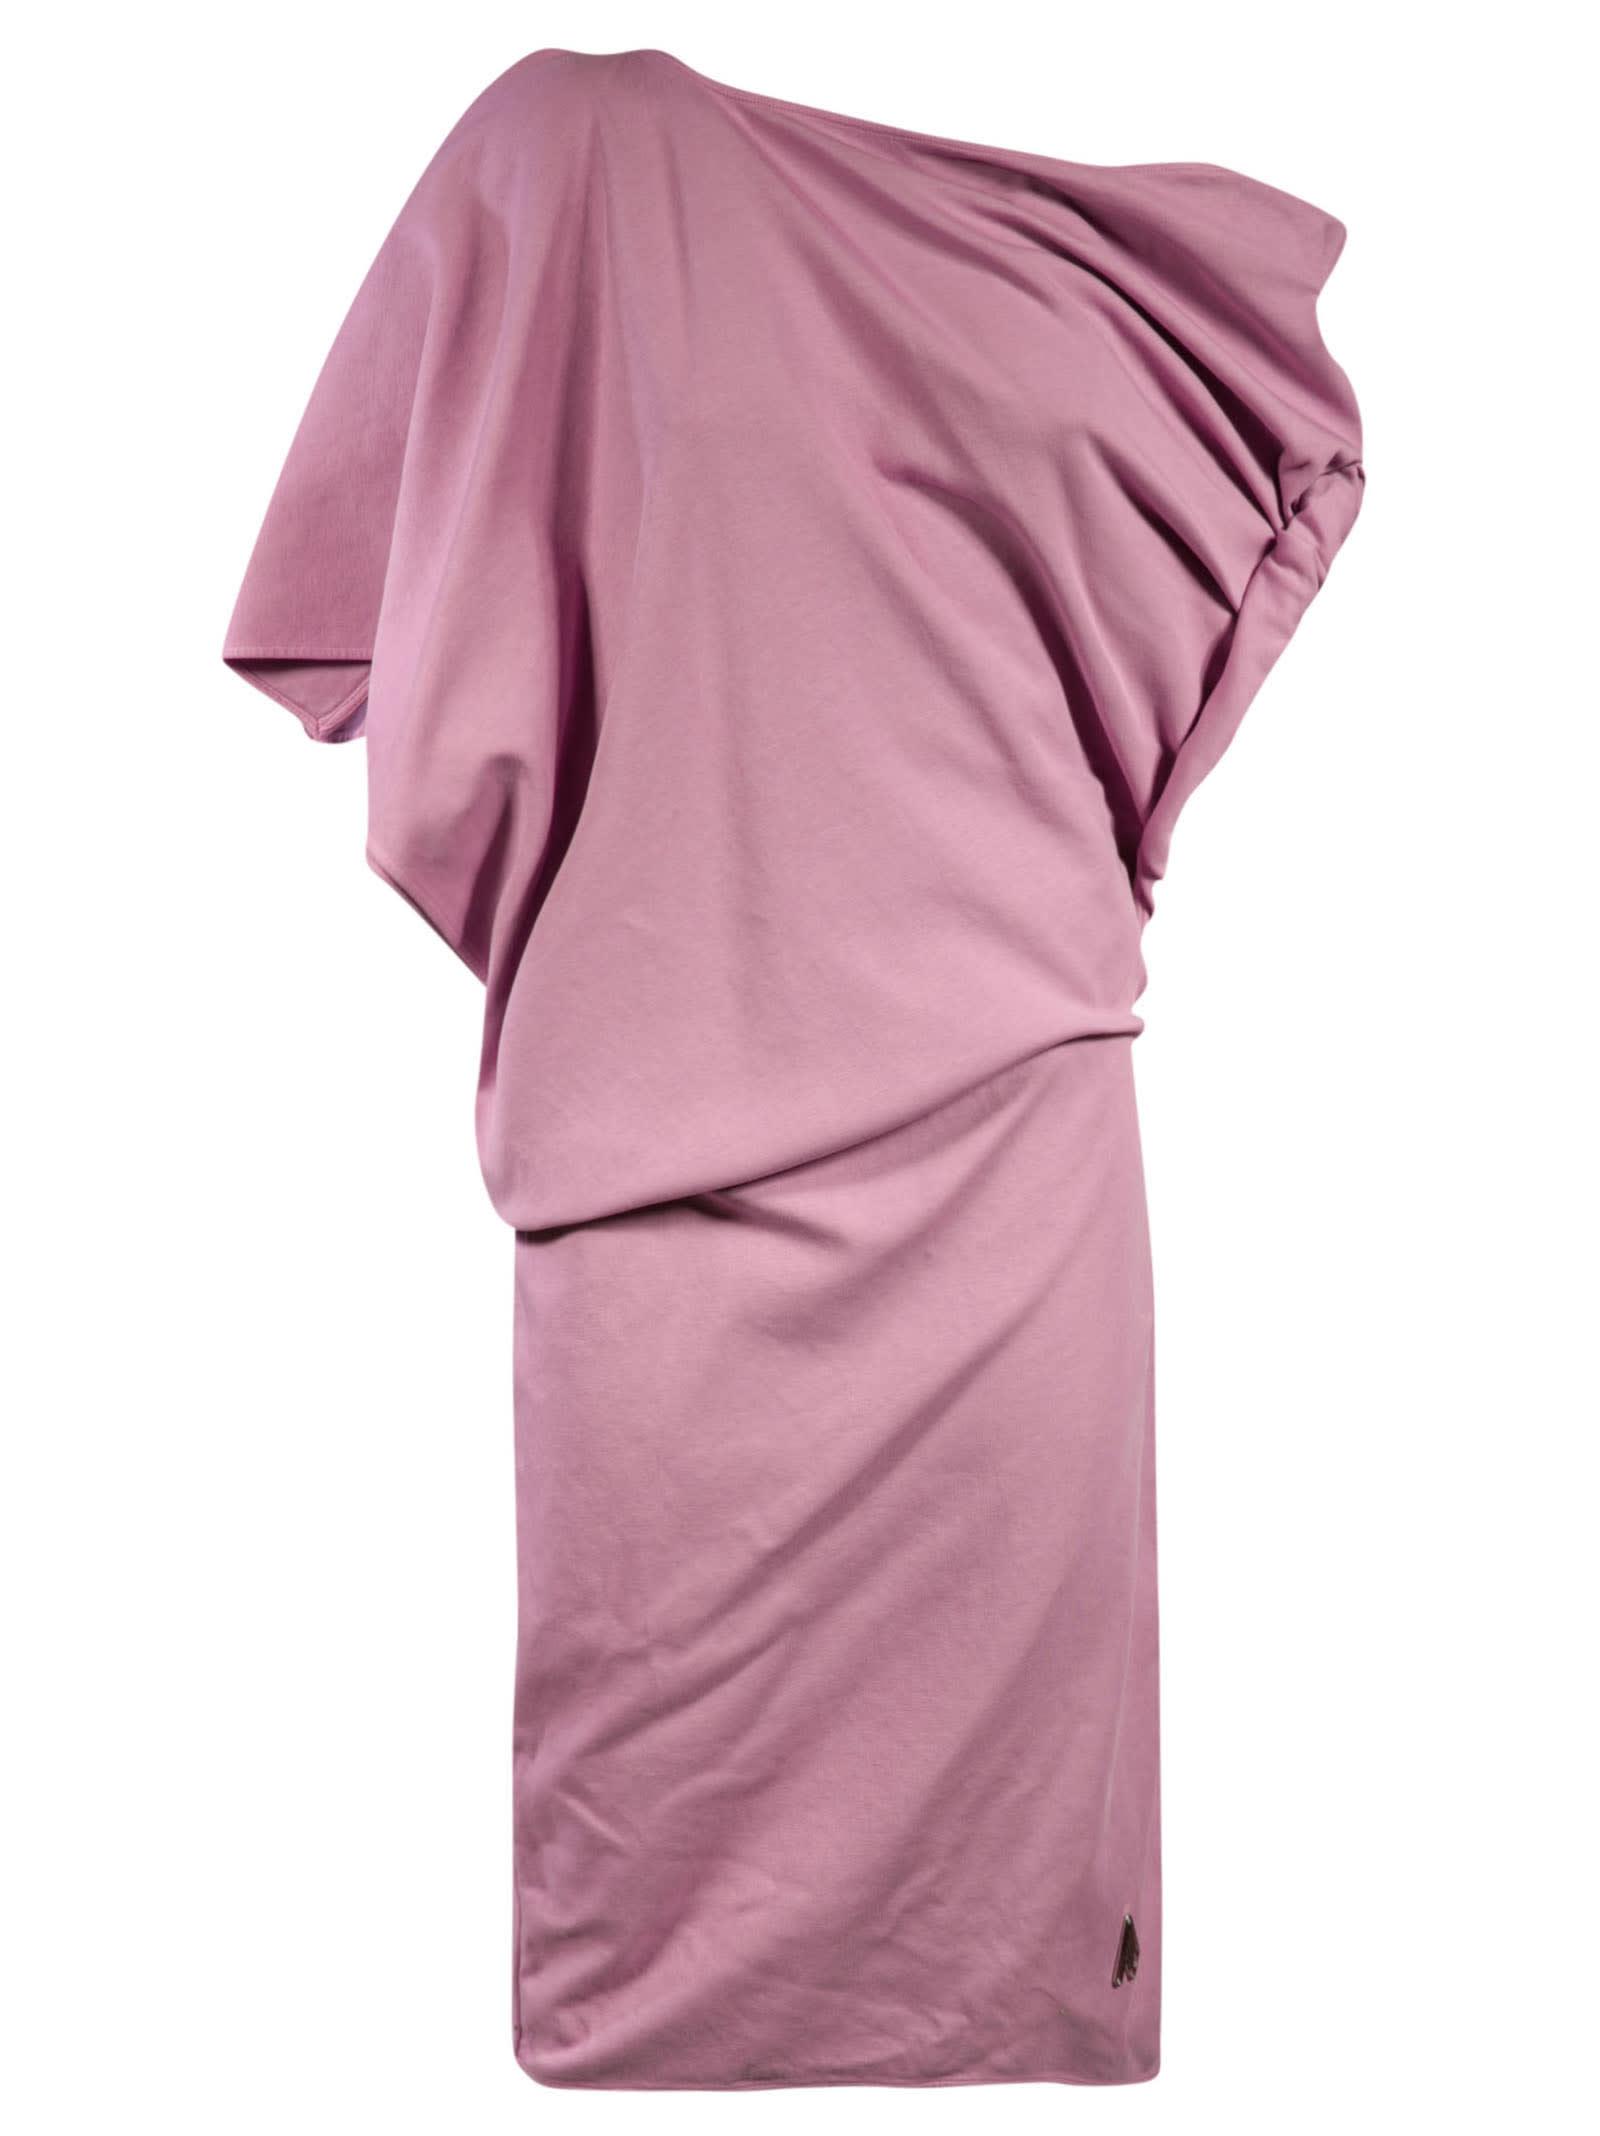 Attico Cottons MINI ONE-SHOULDER DRESS